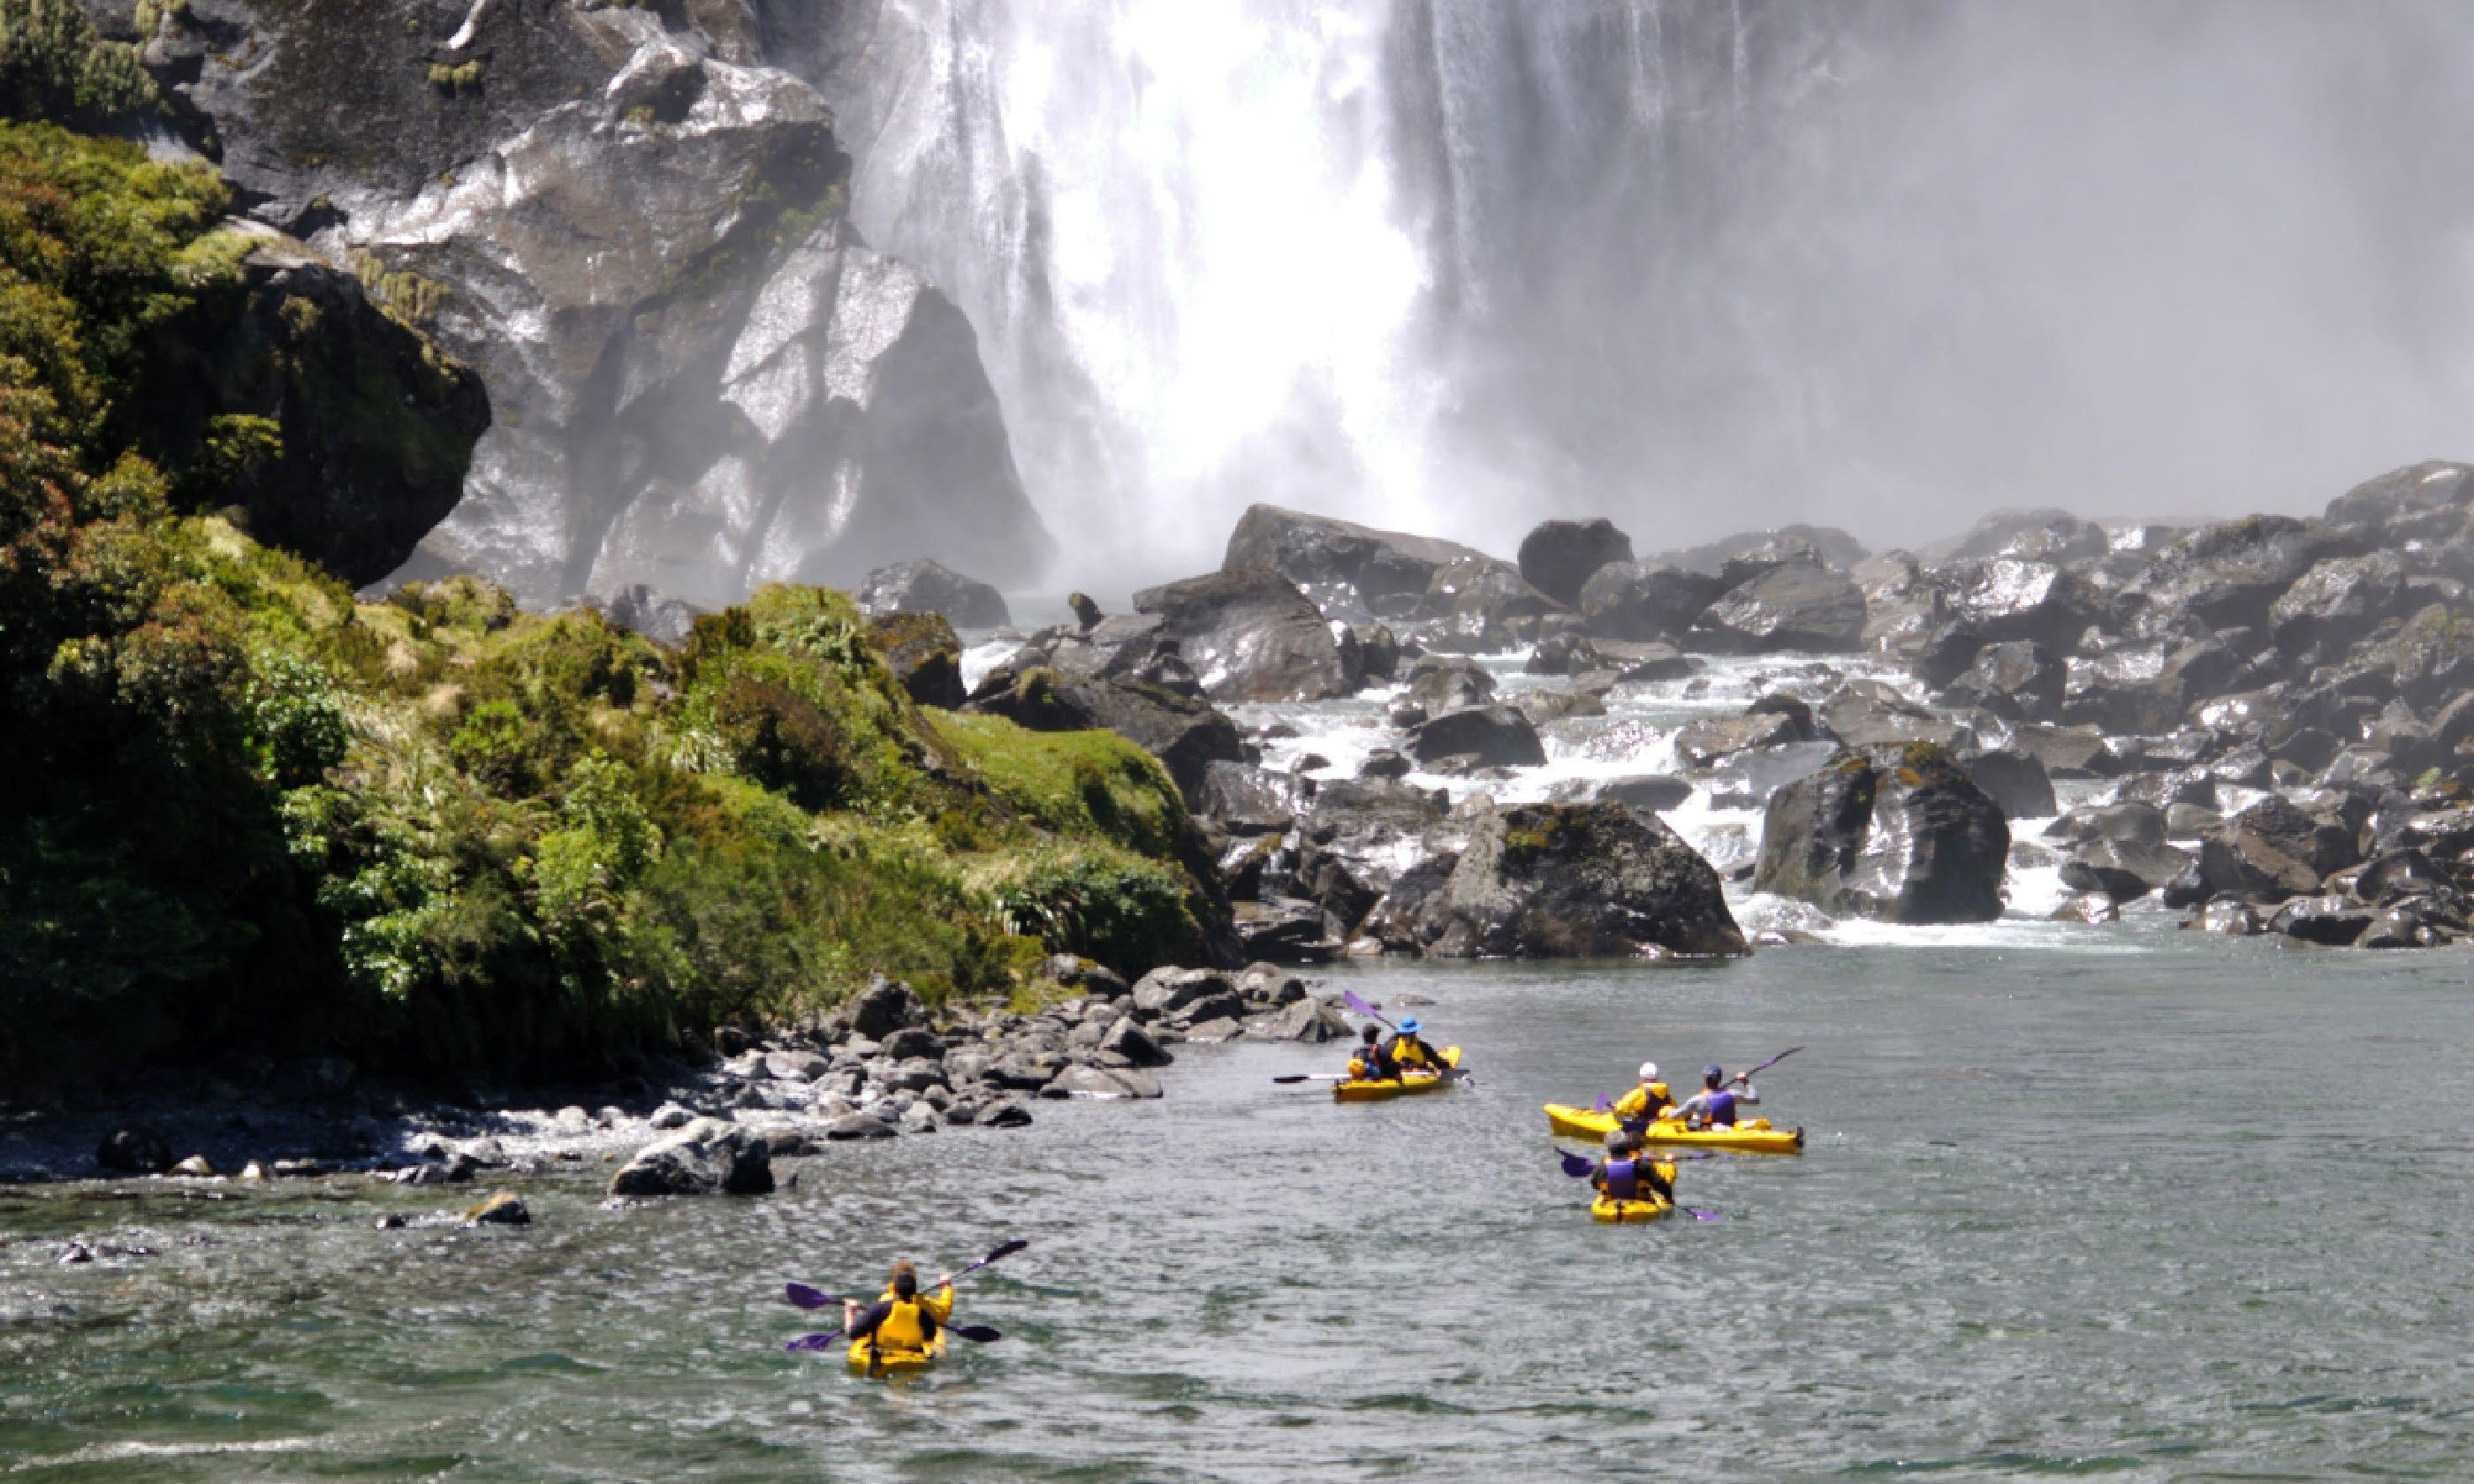 Kayaking at Milford Sound, New Zealand (Shutterstock)